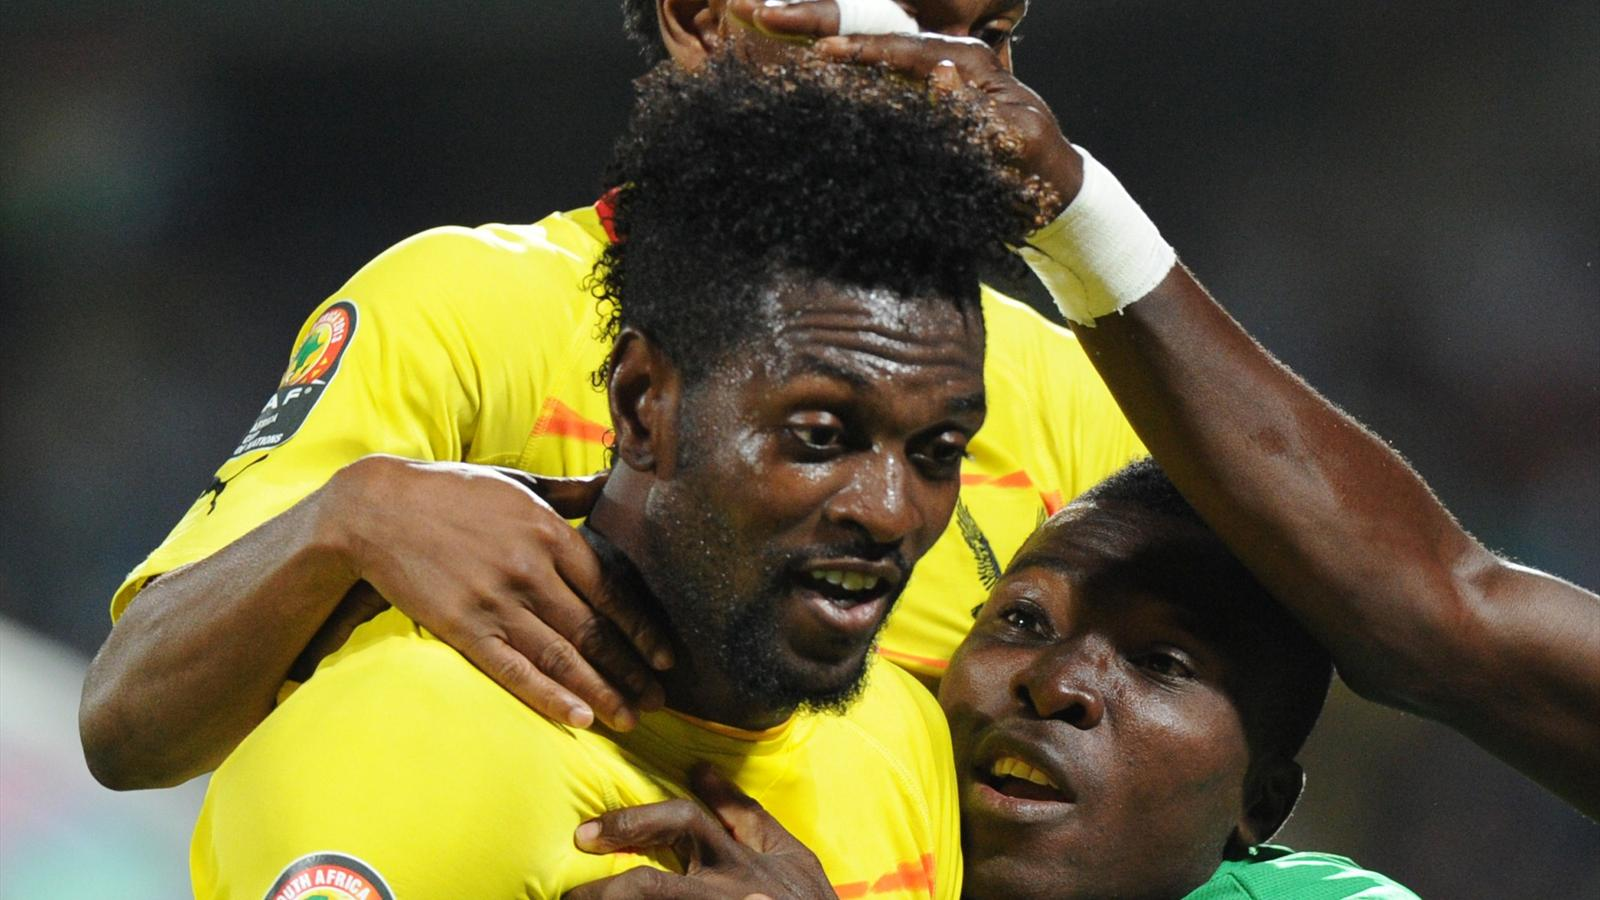 Emmanuel Adebayor set to play for Togo despite late ...